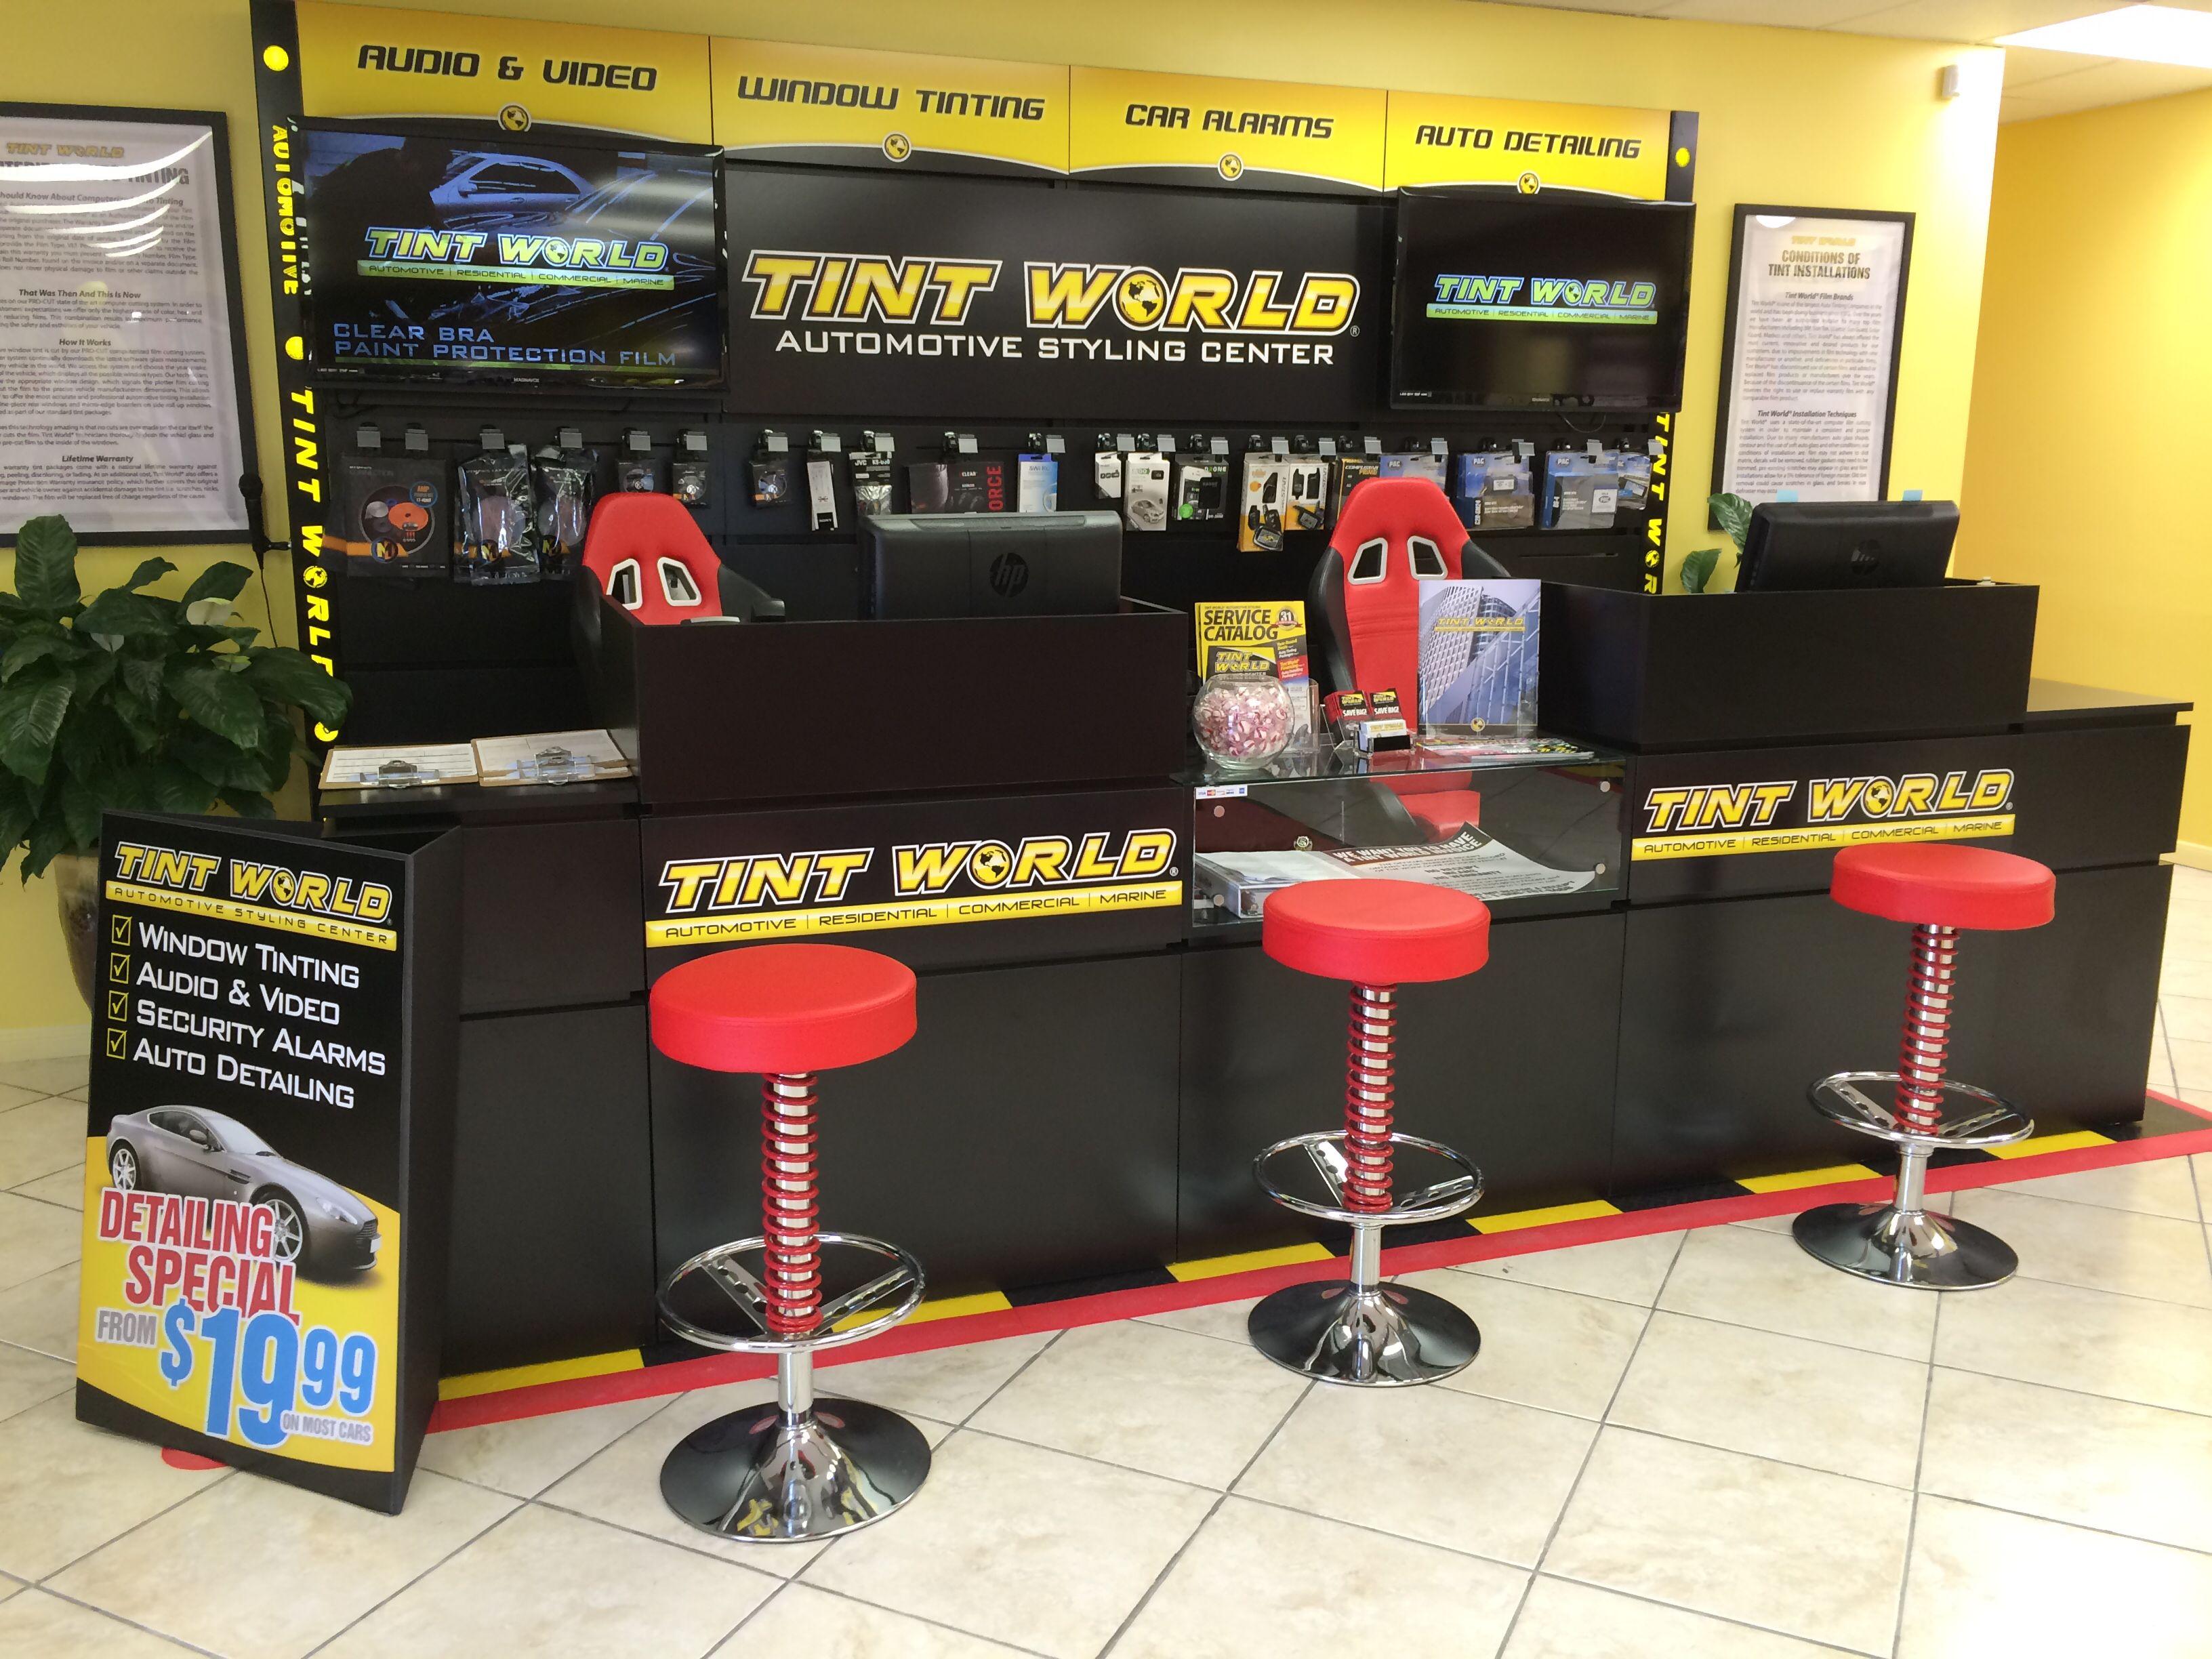 Tint World Houston TX G/O Tints, Automotive accessories